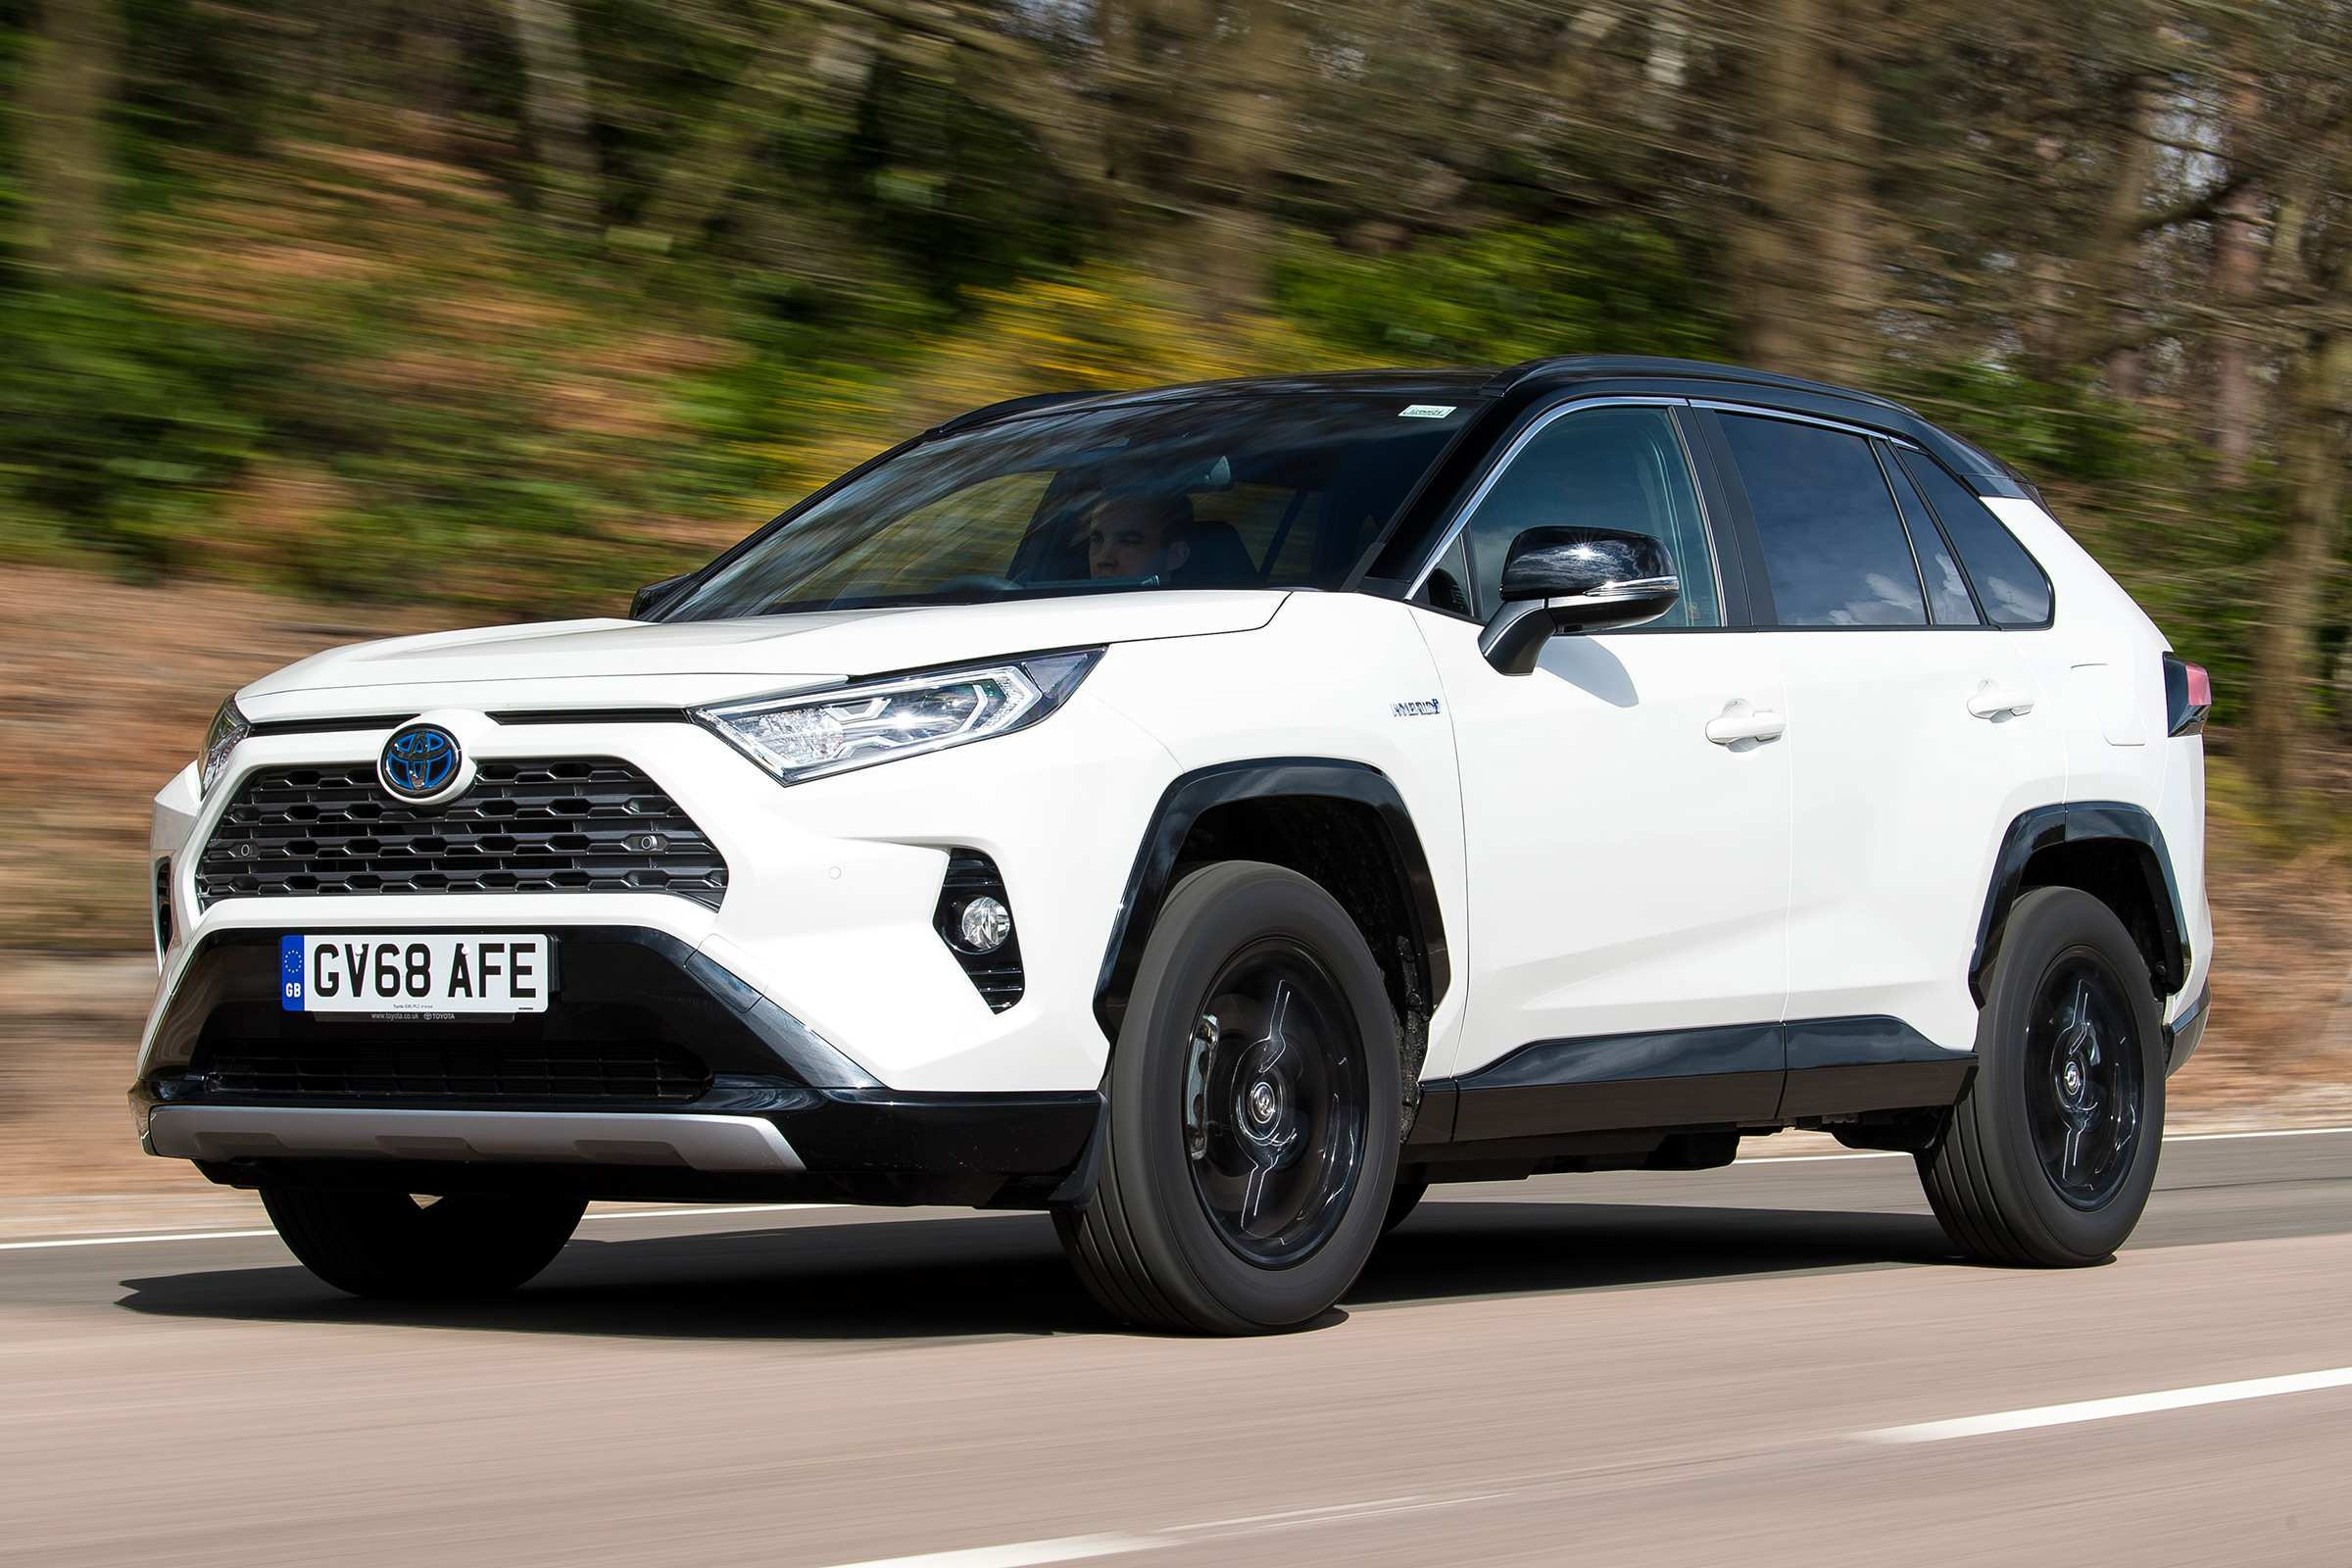 16 New Best Toyota Rav4 Hybrid 2019 Specs And Review Price by Best Toyota Rav4 Hybrid 2019 Specs And Review